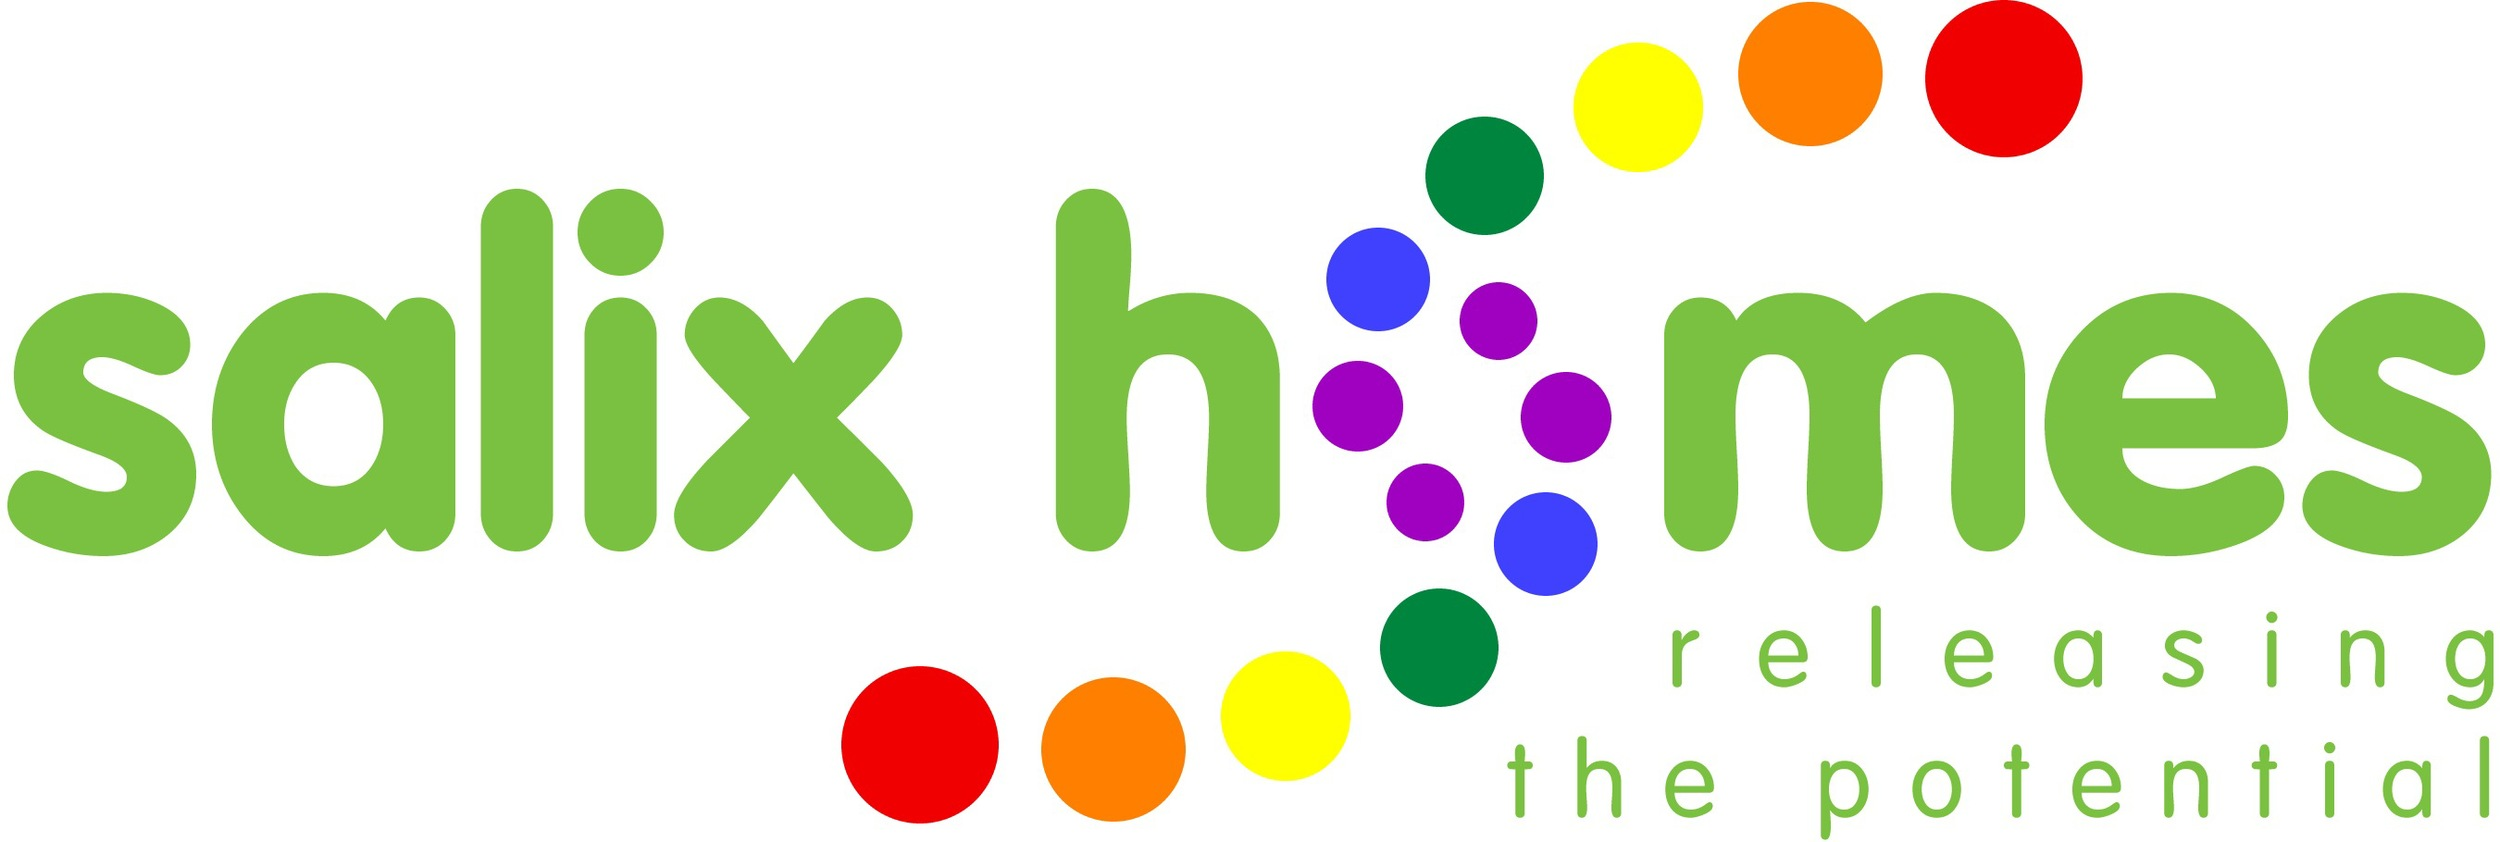 Salix homes pride logo.jpg